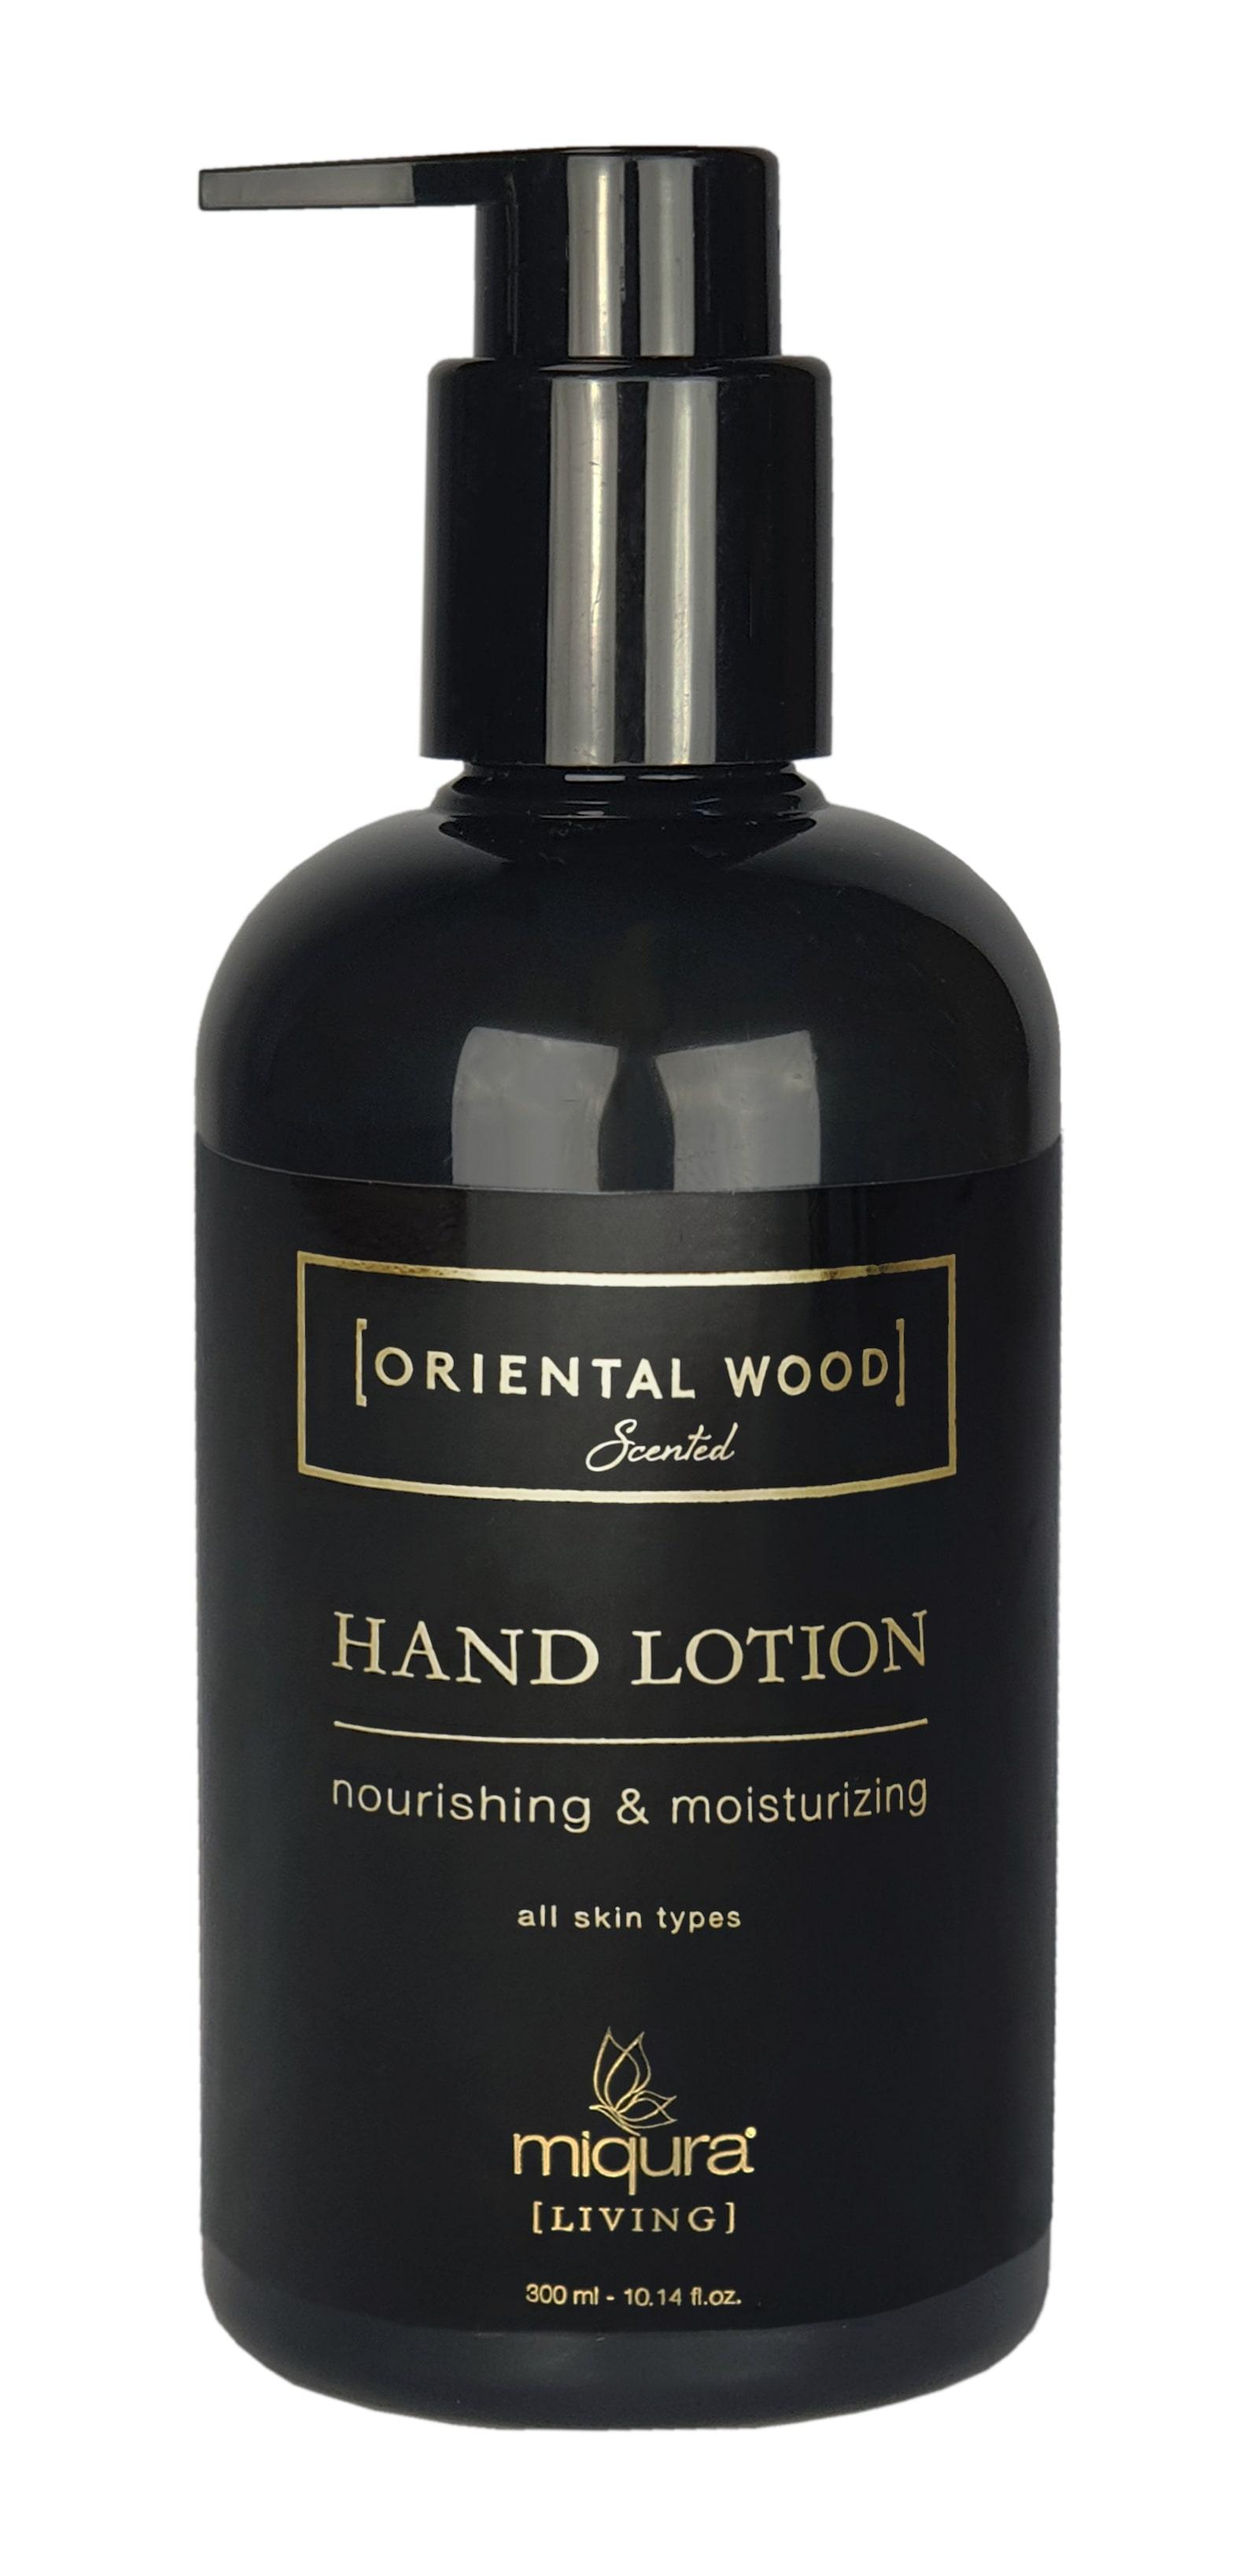 Miqura Living Oriental Wood Hand Lotion, 300 ml